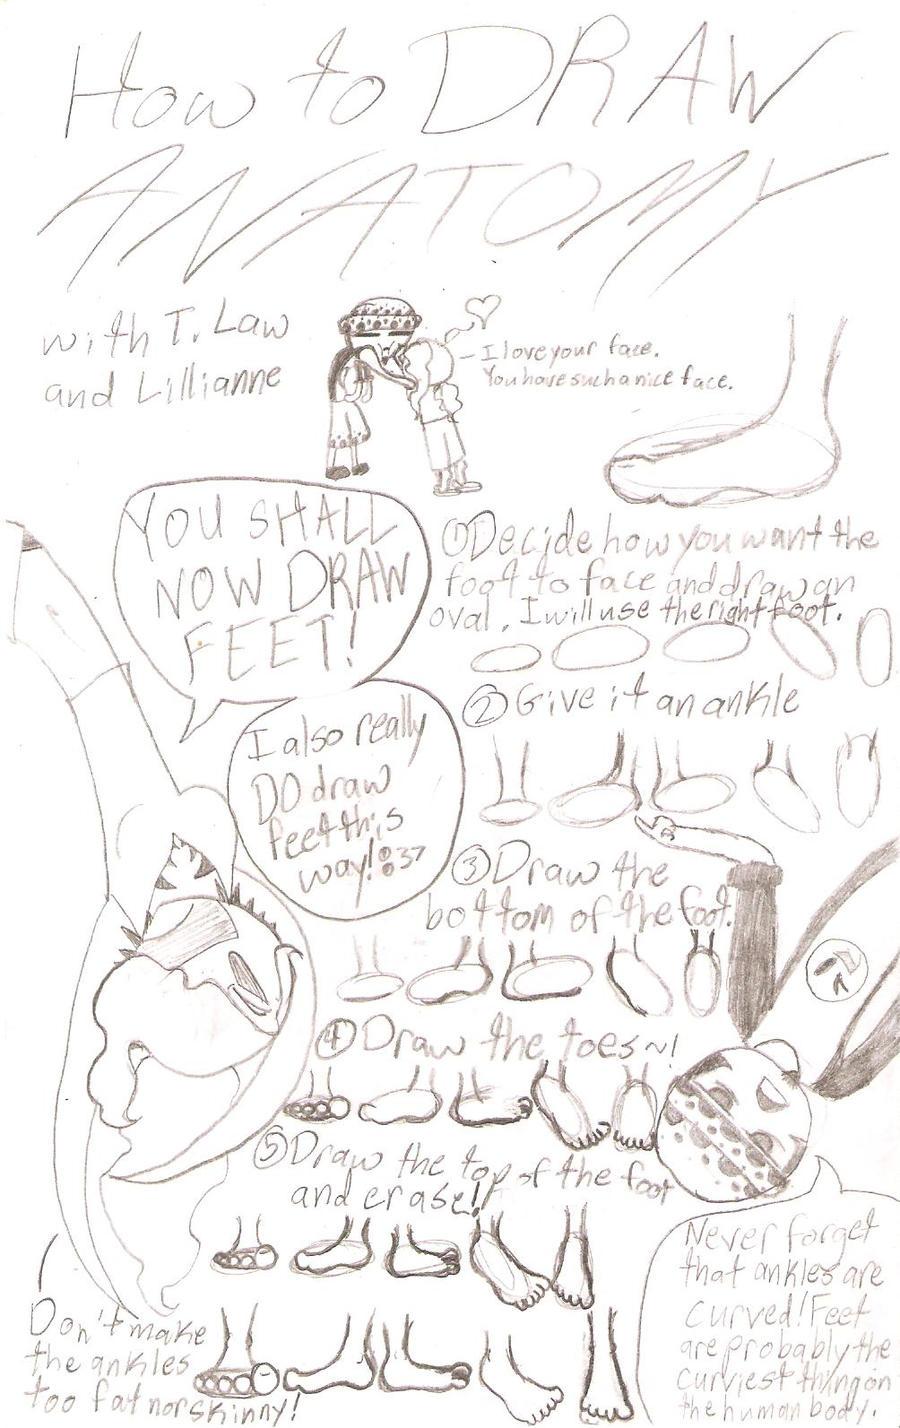 How To Draw Anatomy - Feet by Blue-Raccoon-Siren on DeviantArt